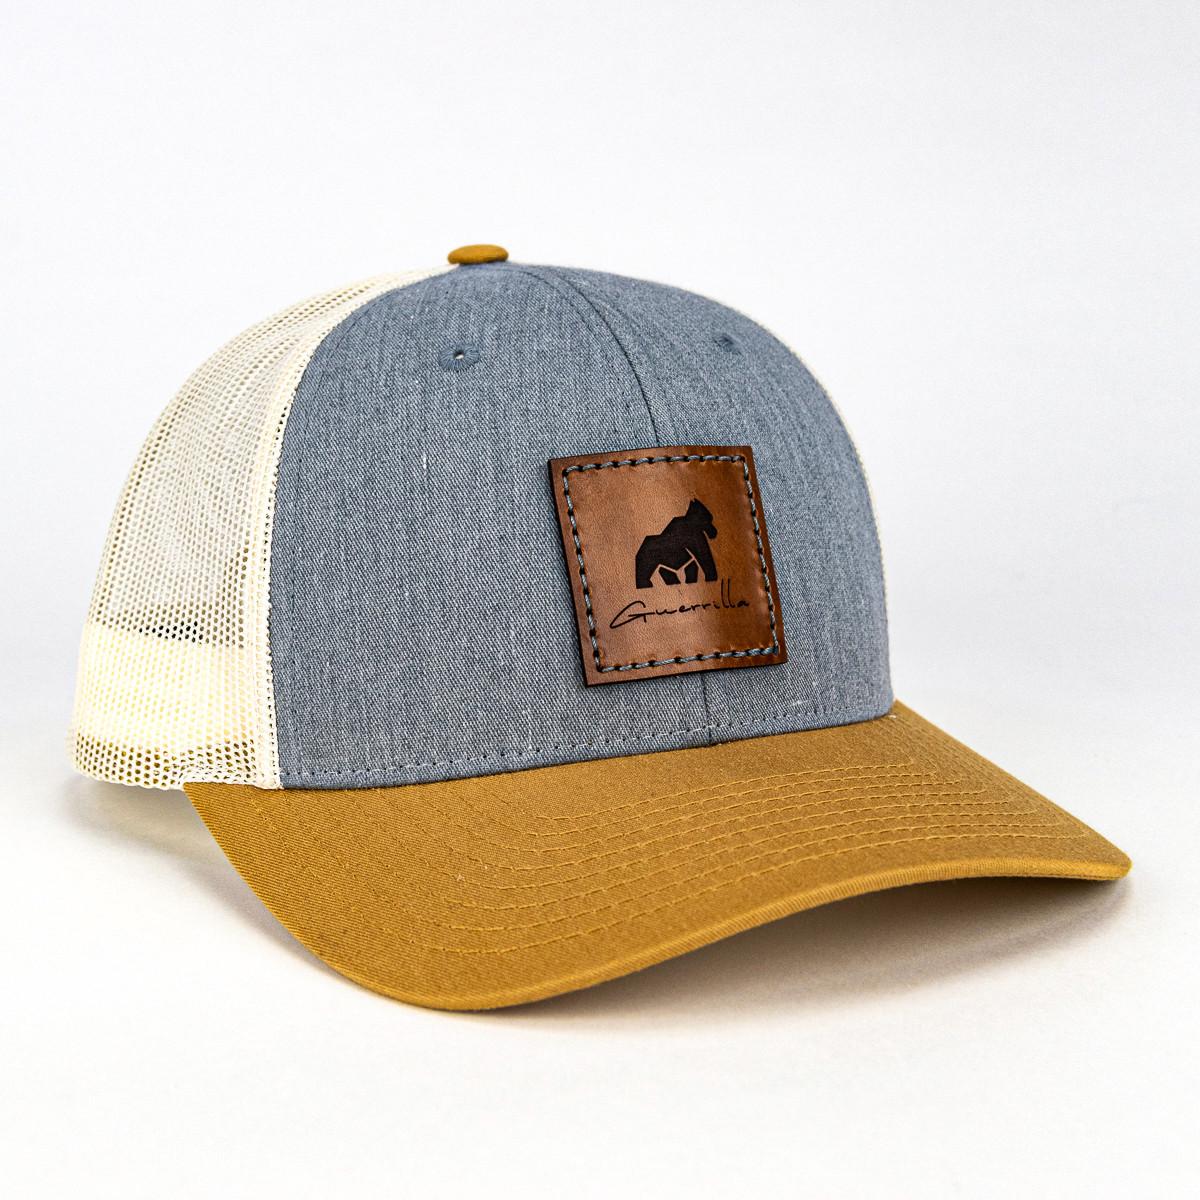 Grey/Beige Leather Guerrilla Hat